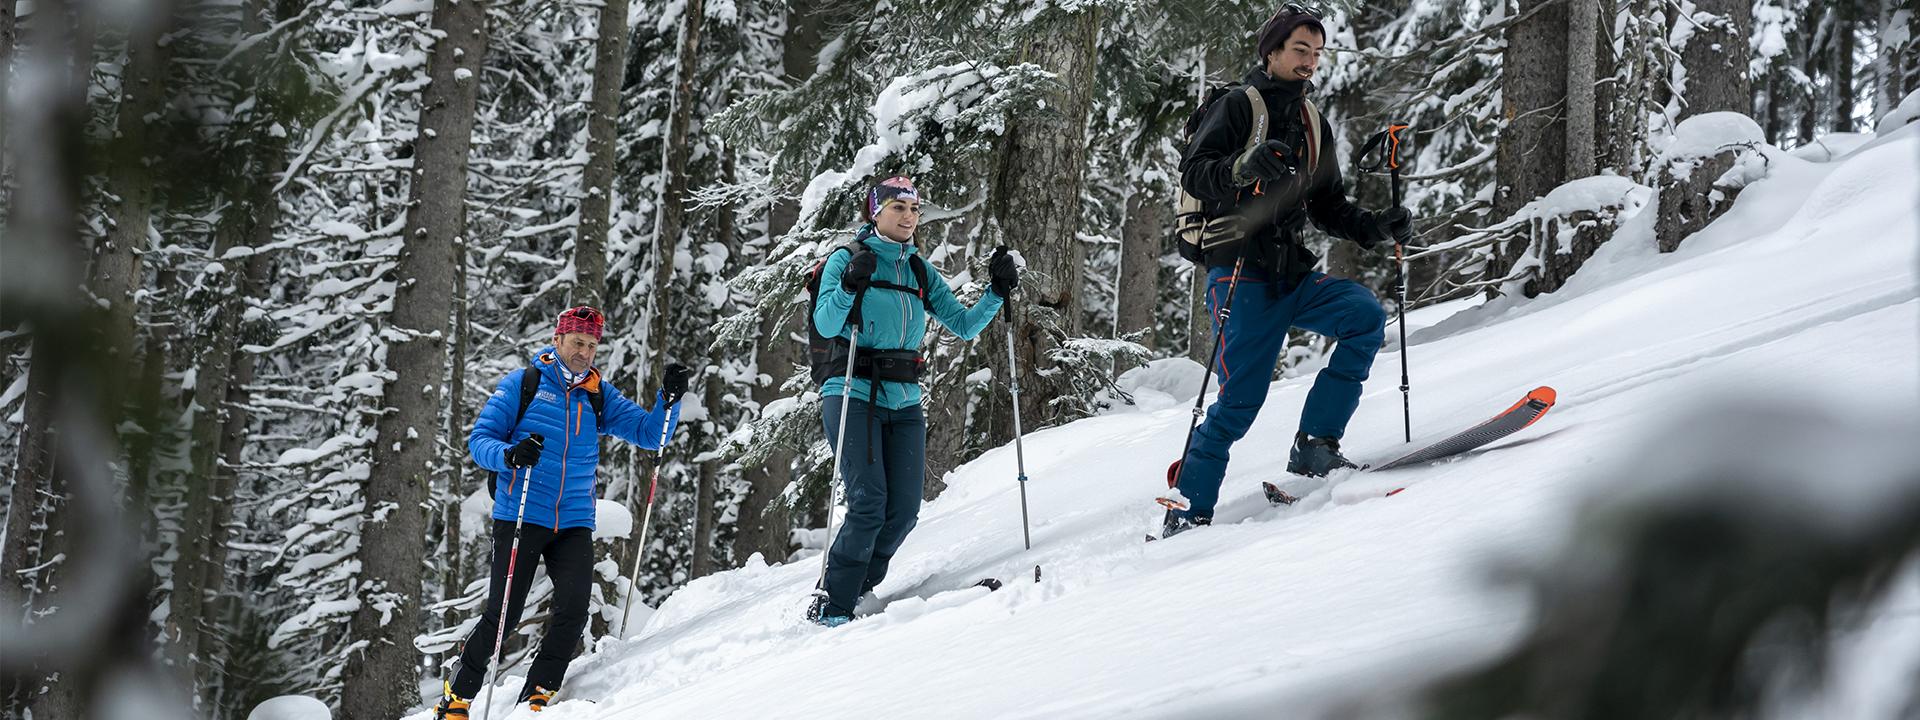 header-skiderando@MilloMoravski